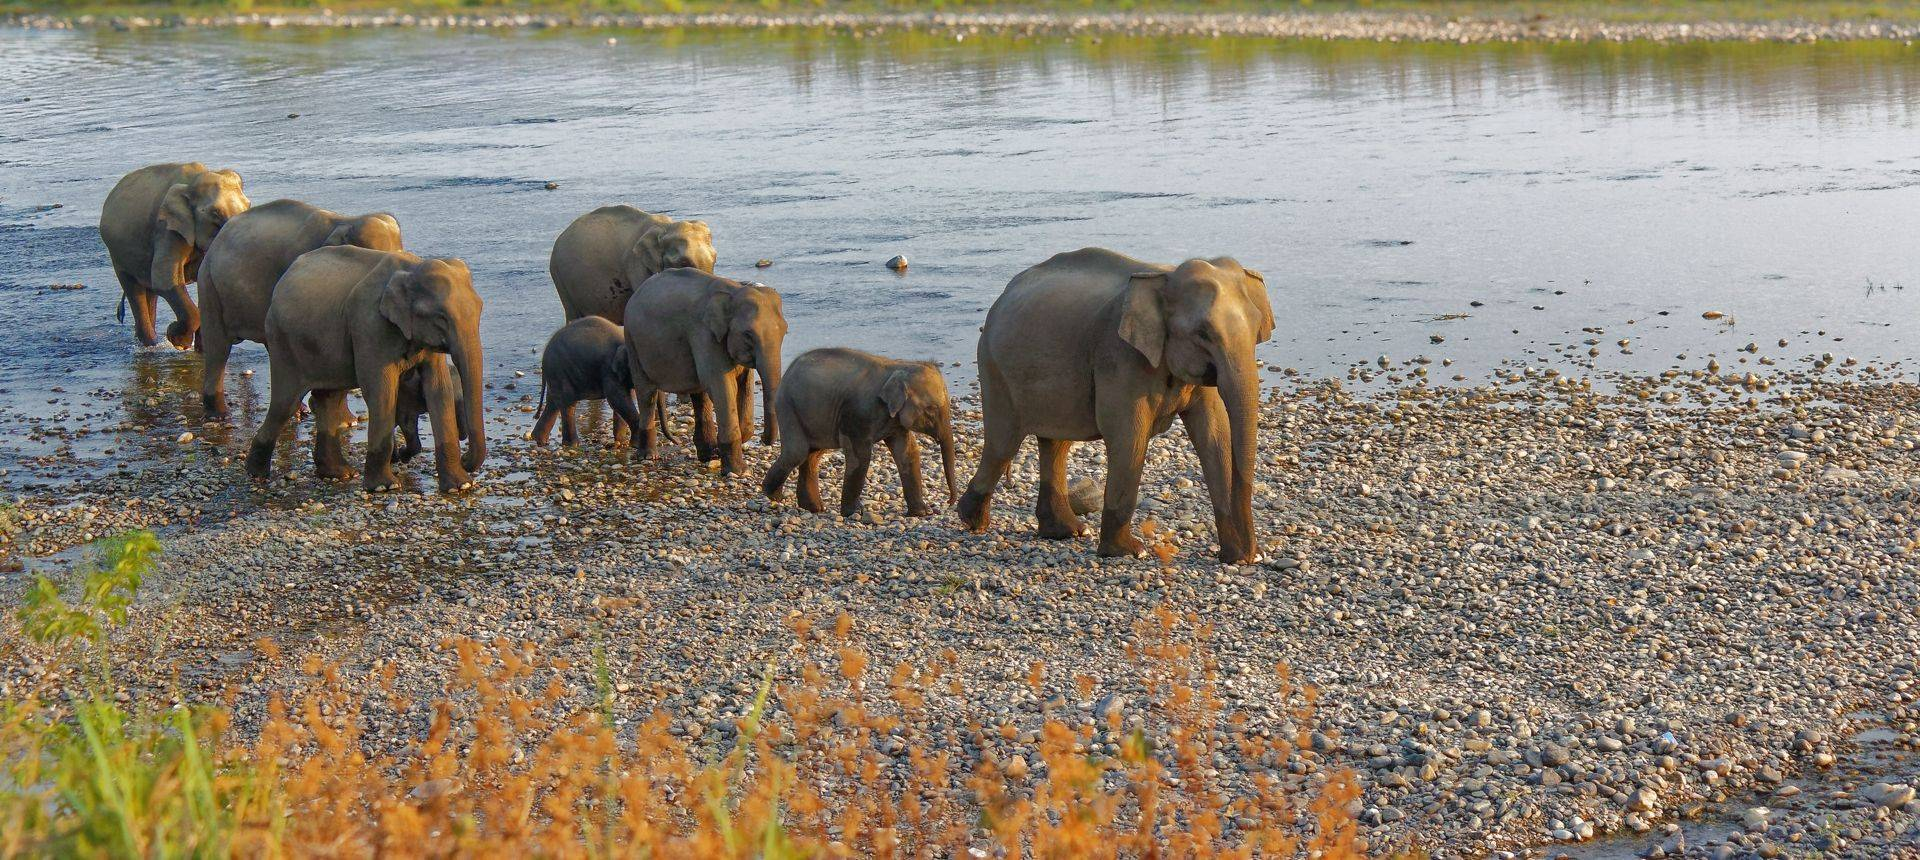 Indian Elephants, Corbett, India Shutterstock 765245173